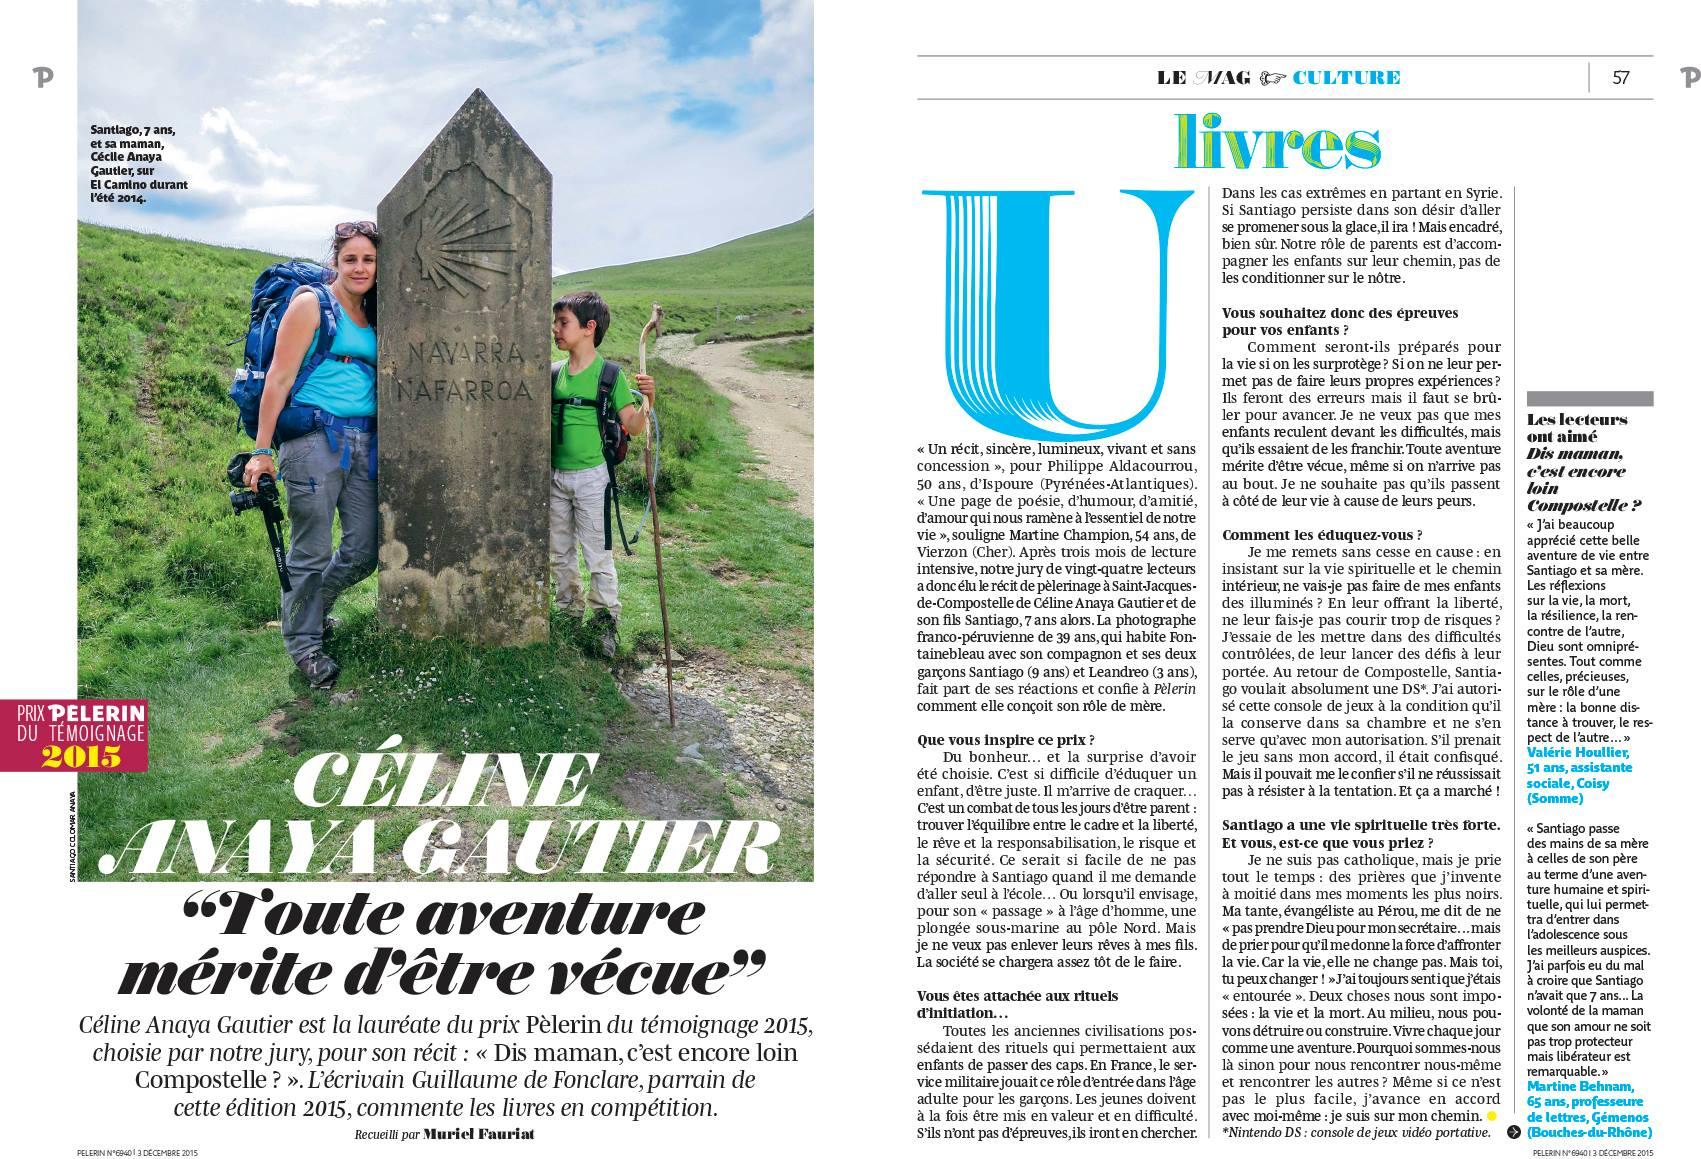 Pèlerin Magazine - Prix du Témoignage